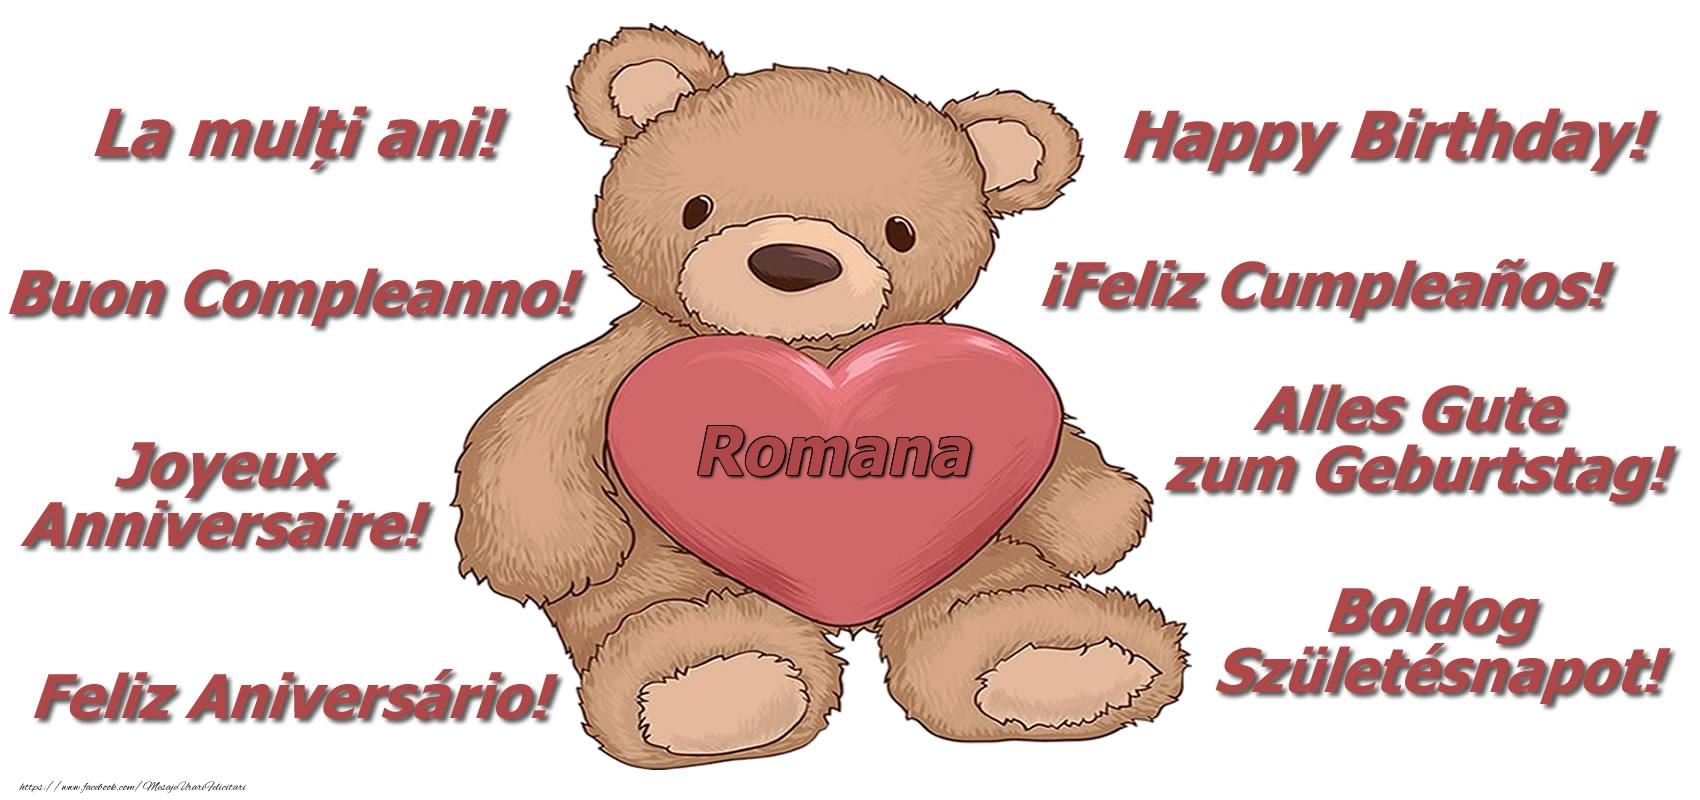 Felicitari de zi de nastere - La multi ani Romana! - Ursulet